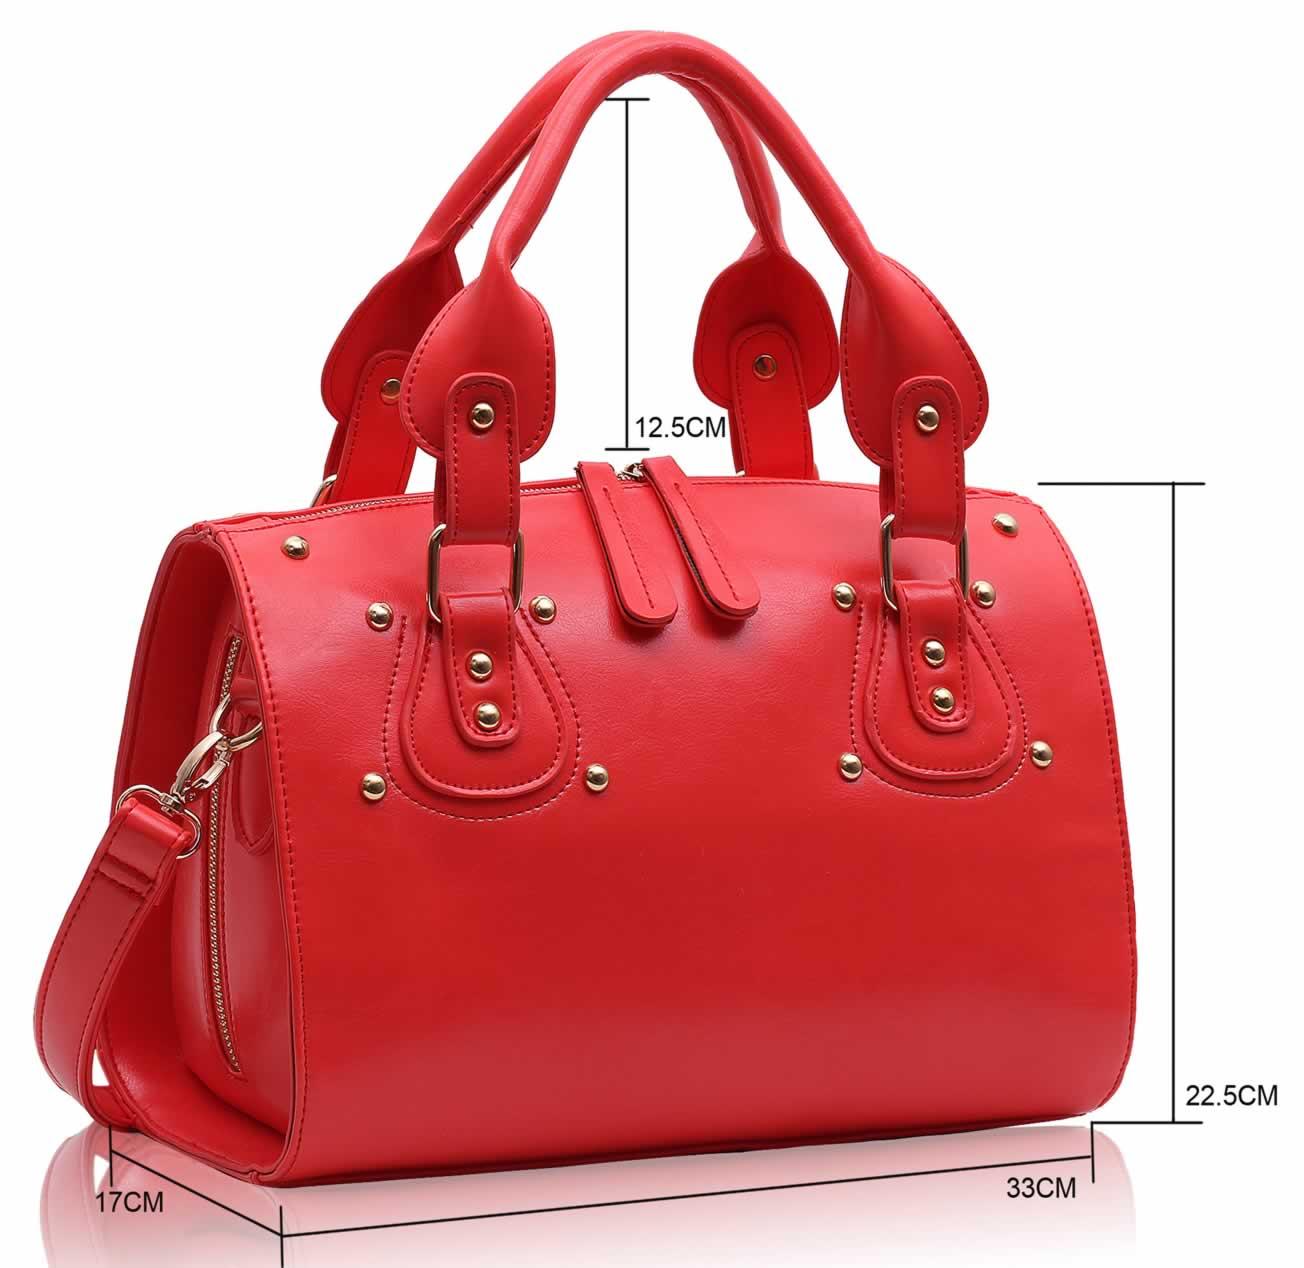 Wholesale Coral Studded Fashion Satchel Handbag